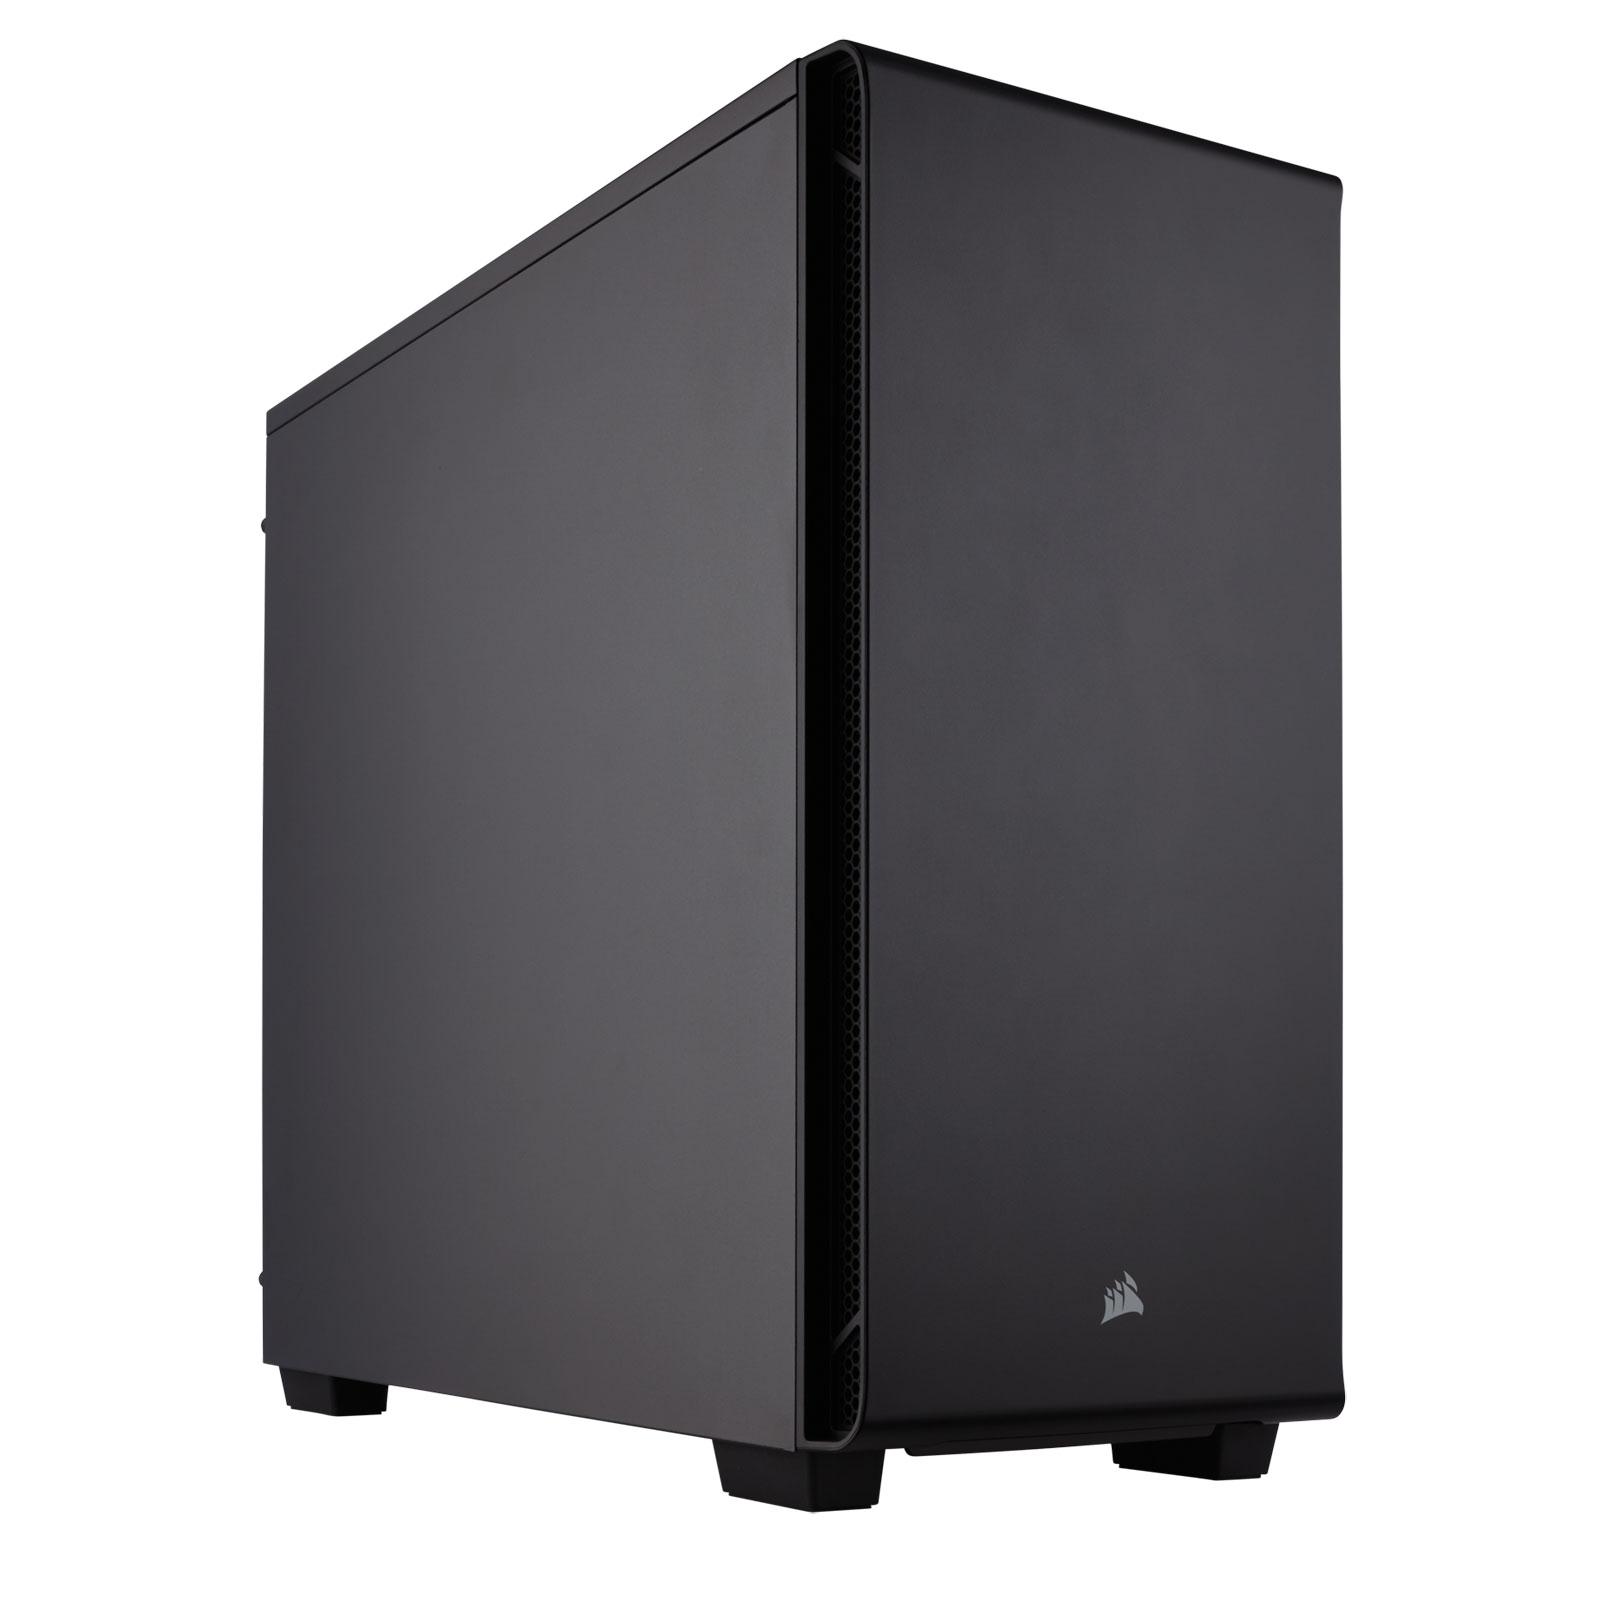 PC de bureau LDLC PC Abaddon APU AMD A10-7870K 8 Go 1 To AMD Radeon R7 (sans OS - non monté)